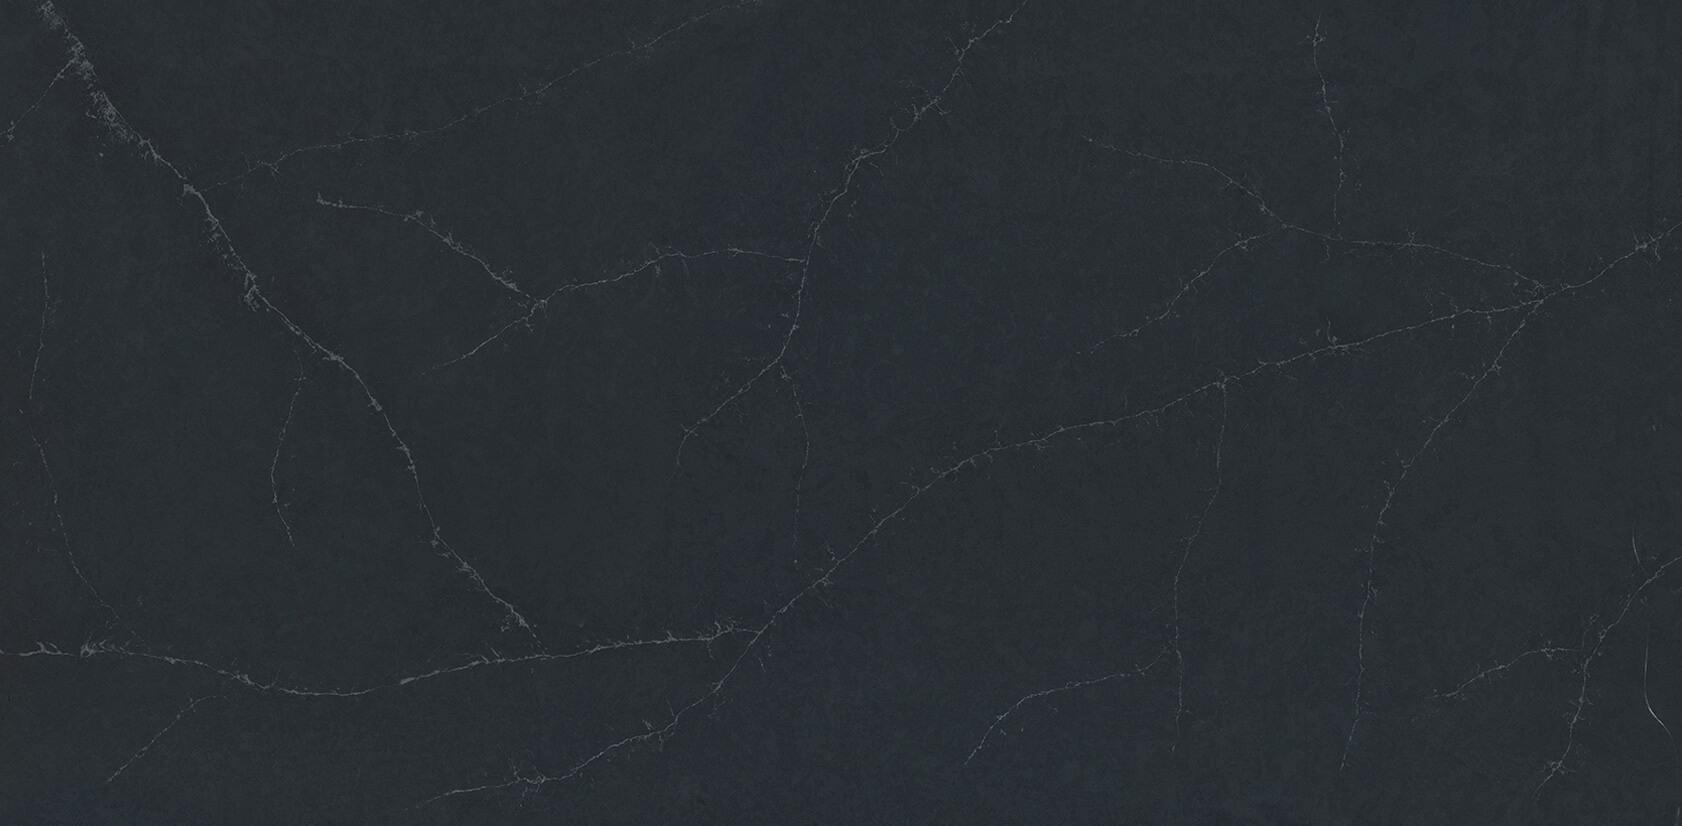 Charcoal Soapstone - Treppenanlagen zum Pauschalpreis 1